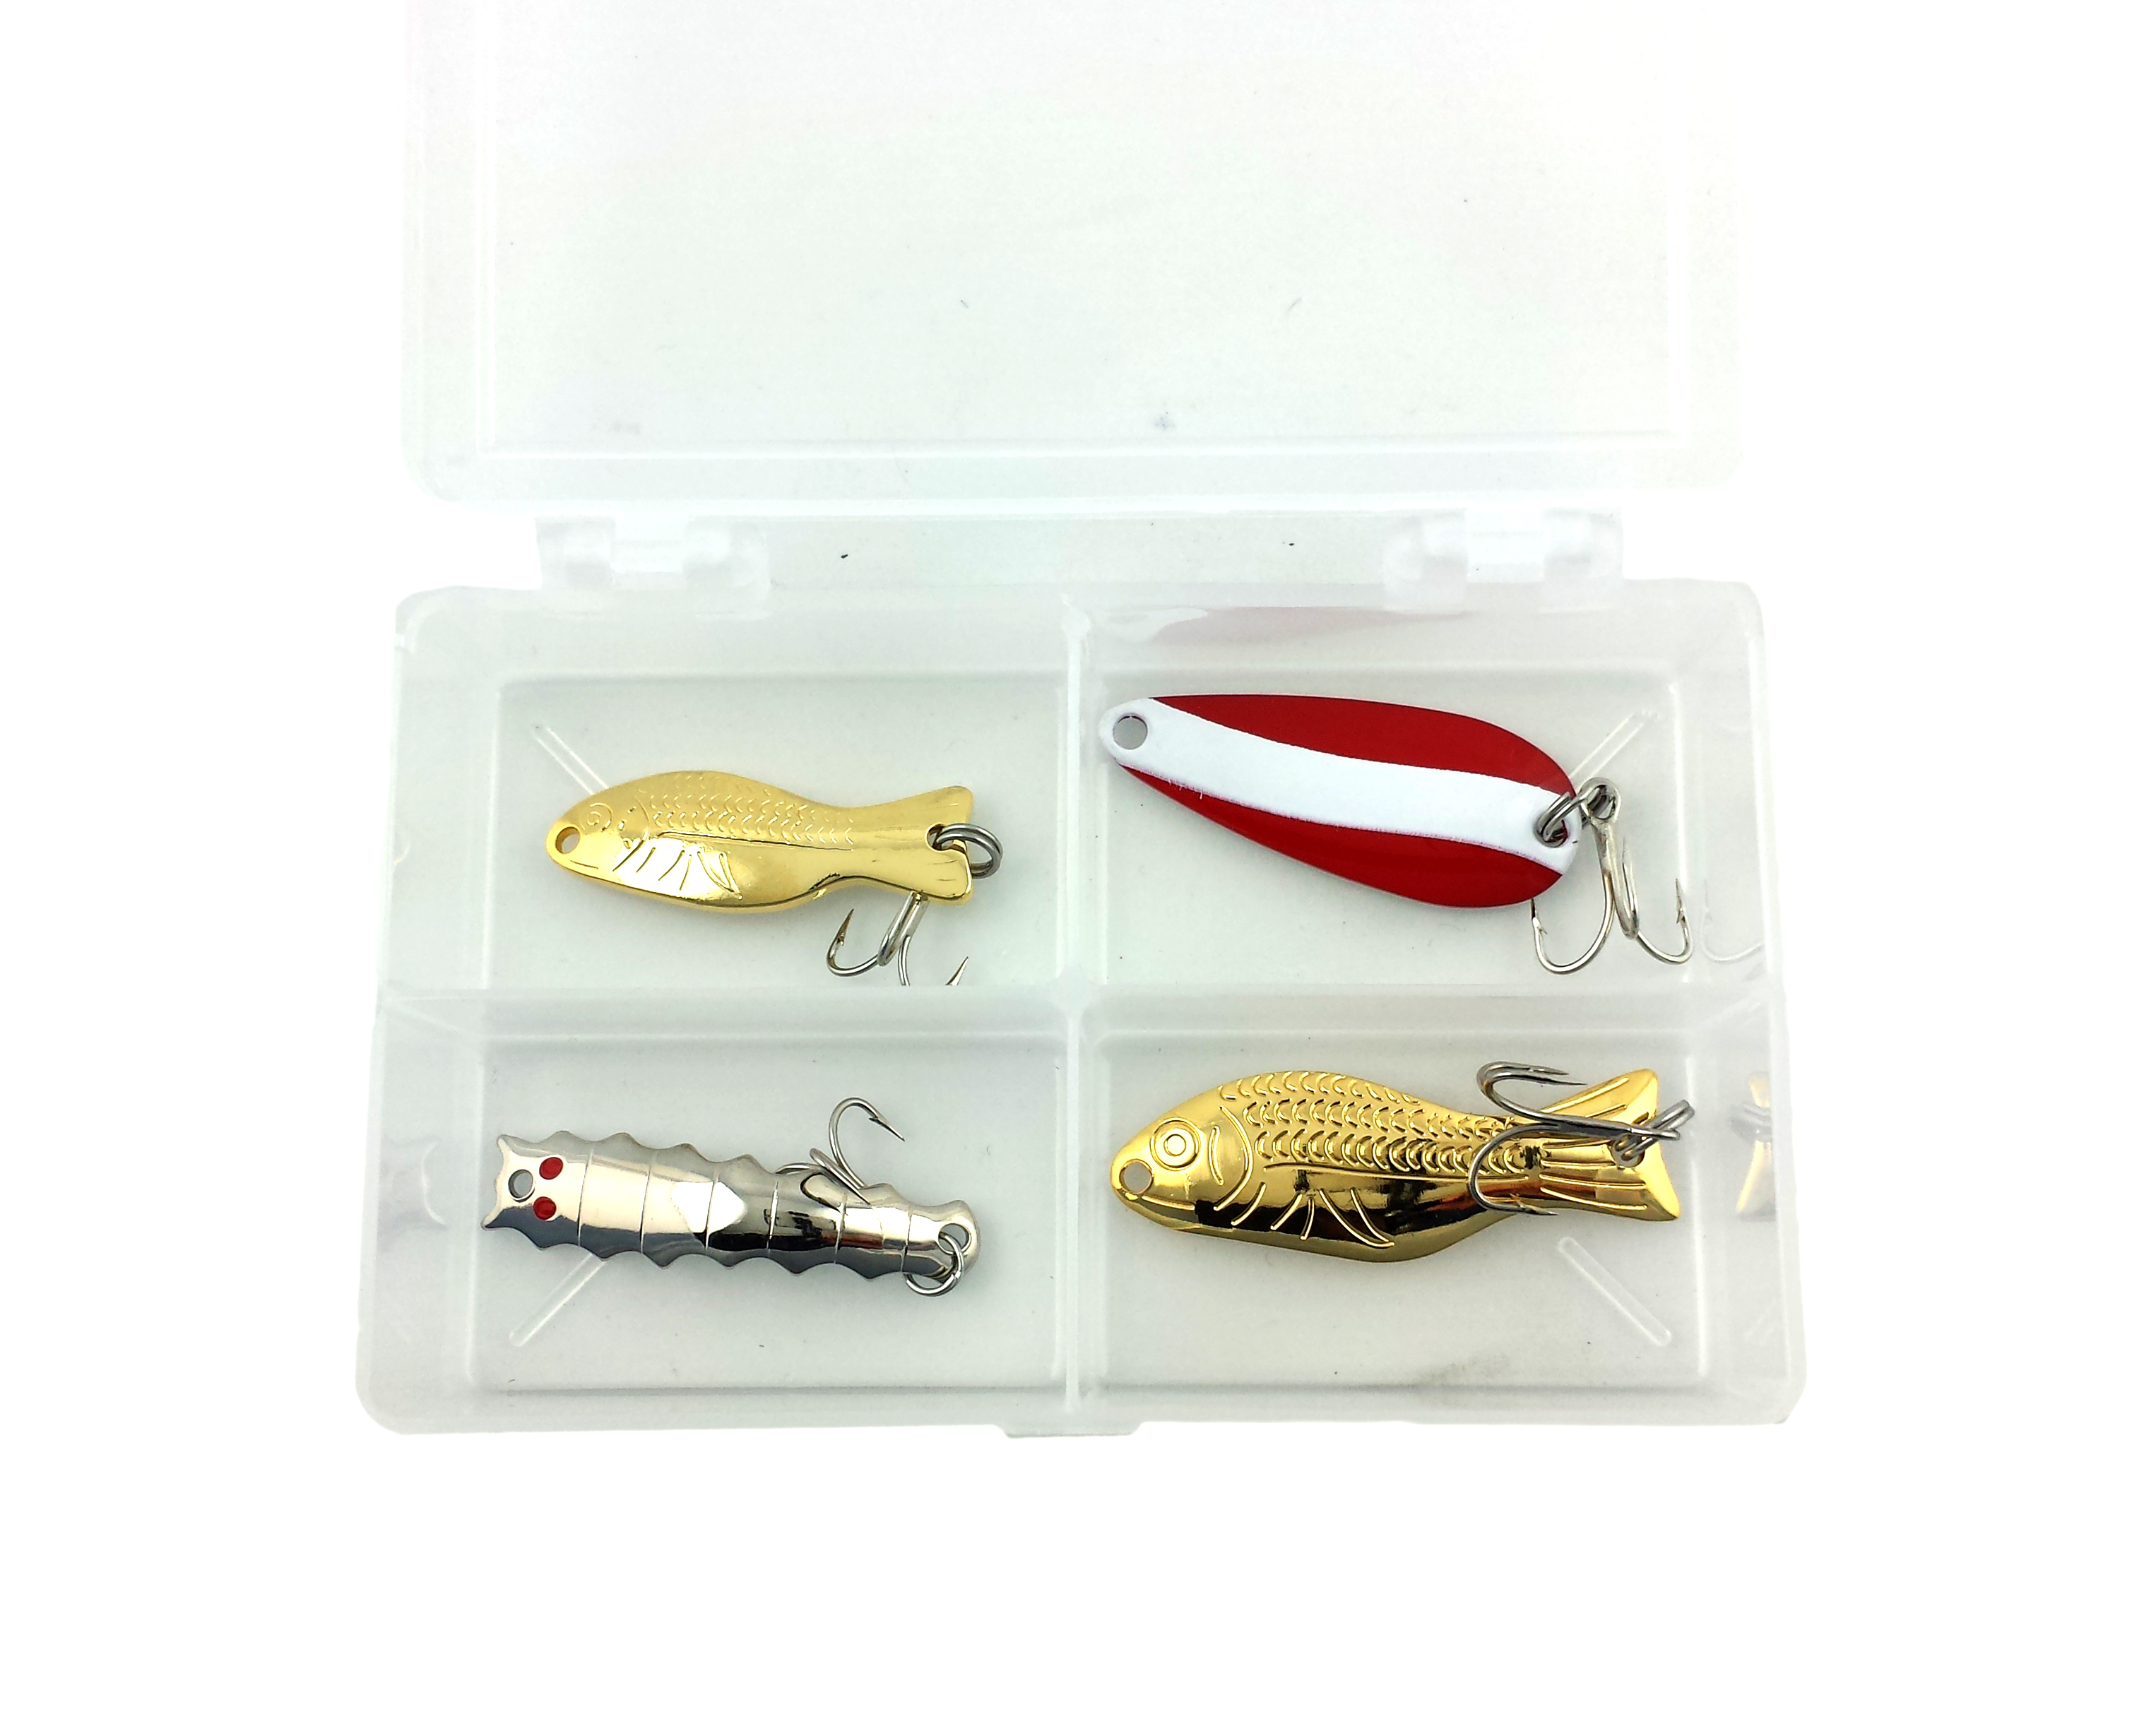 Al 39 s goldfish promotional fishing lures 027 trout kit for Fishing lure kits